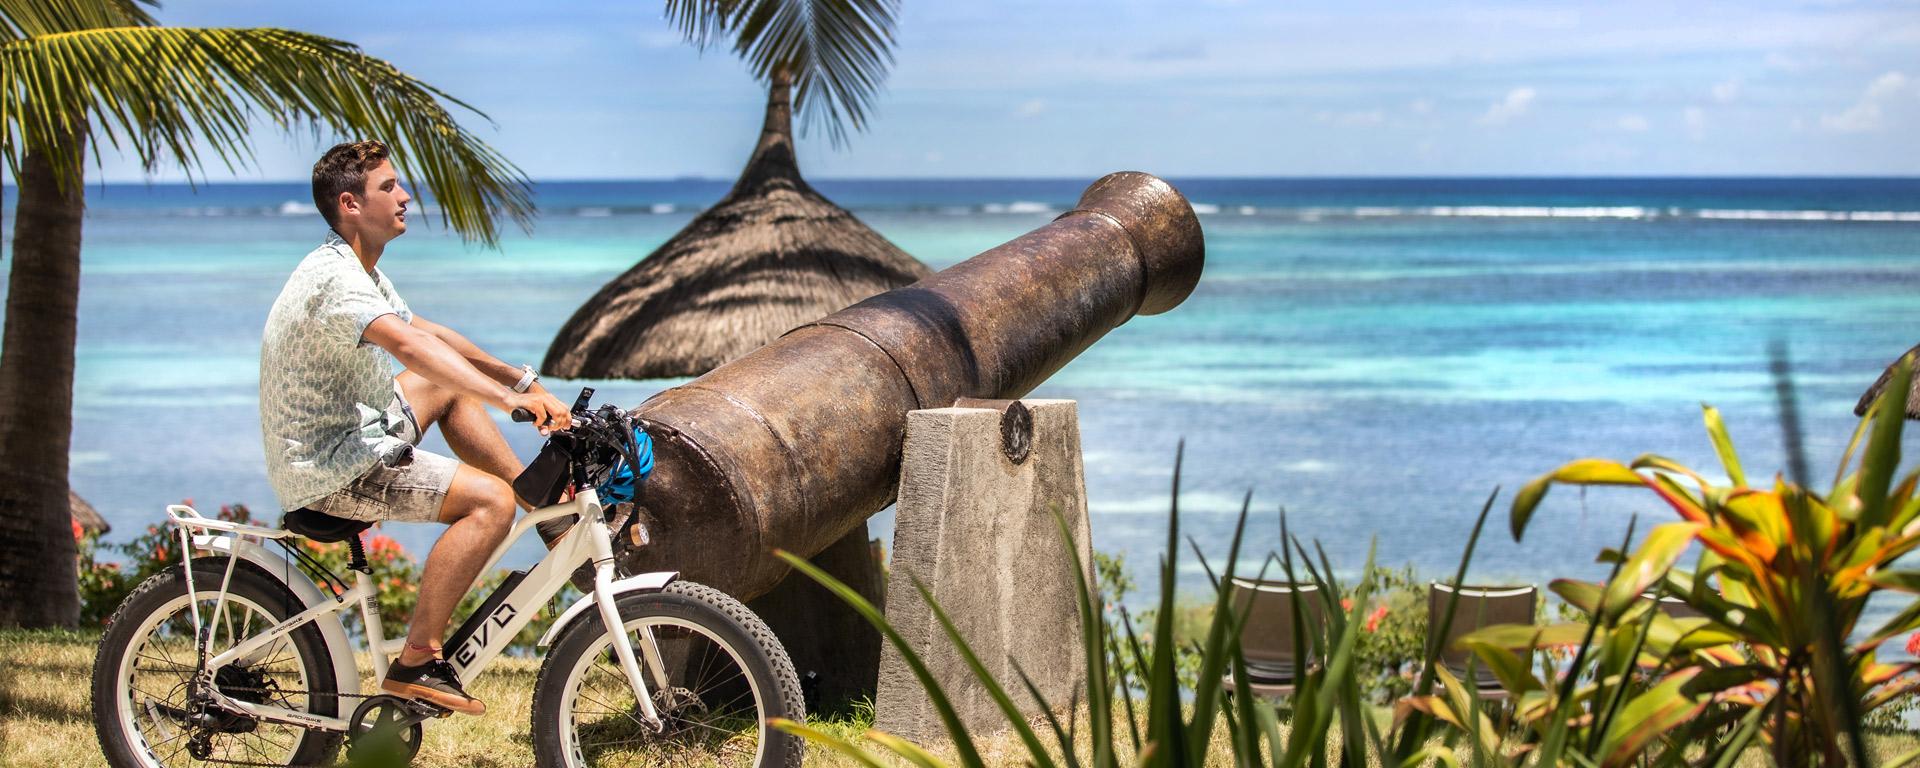 Sports canonnier beachcomber mauritius 2021